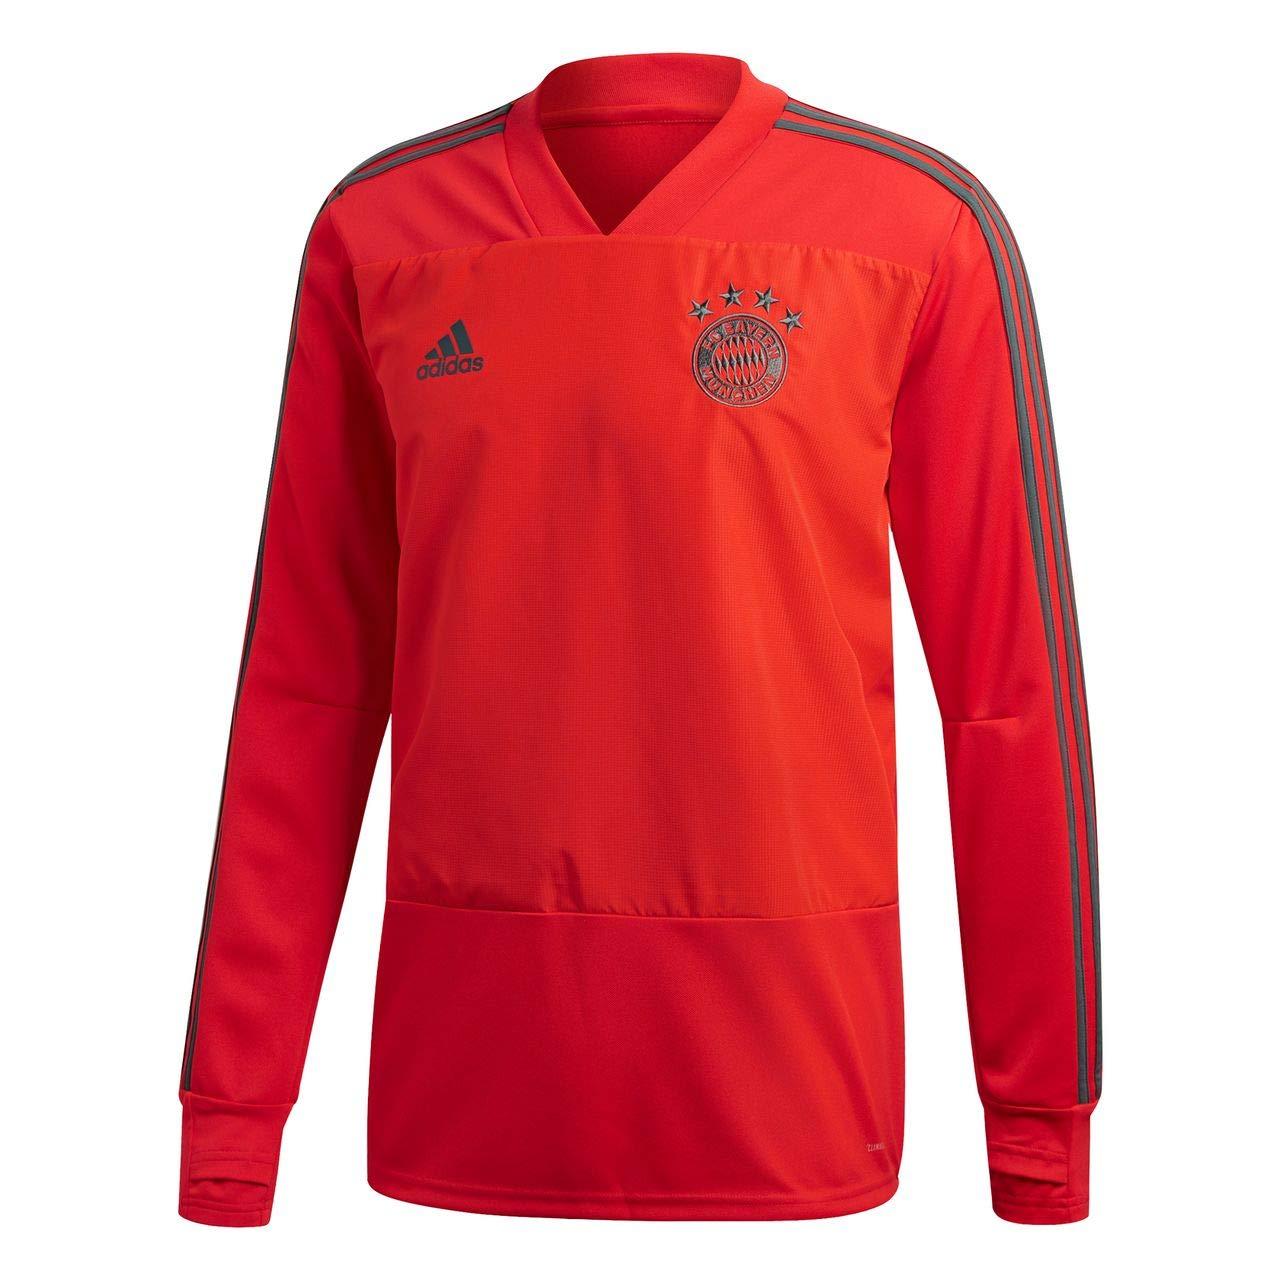 ADIDAS Herren 18 19 Fc Bayern Training Top Sweatshirt